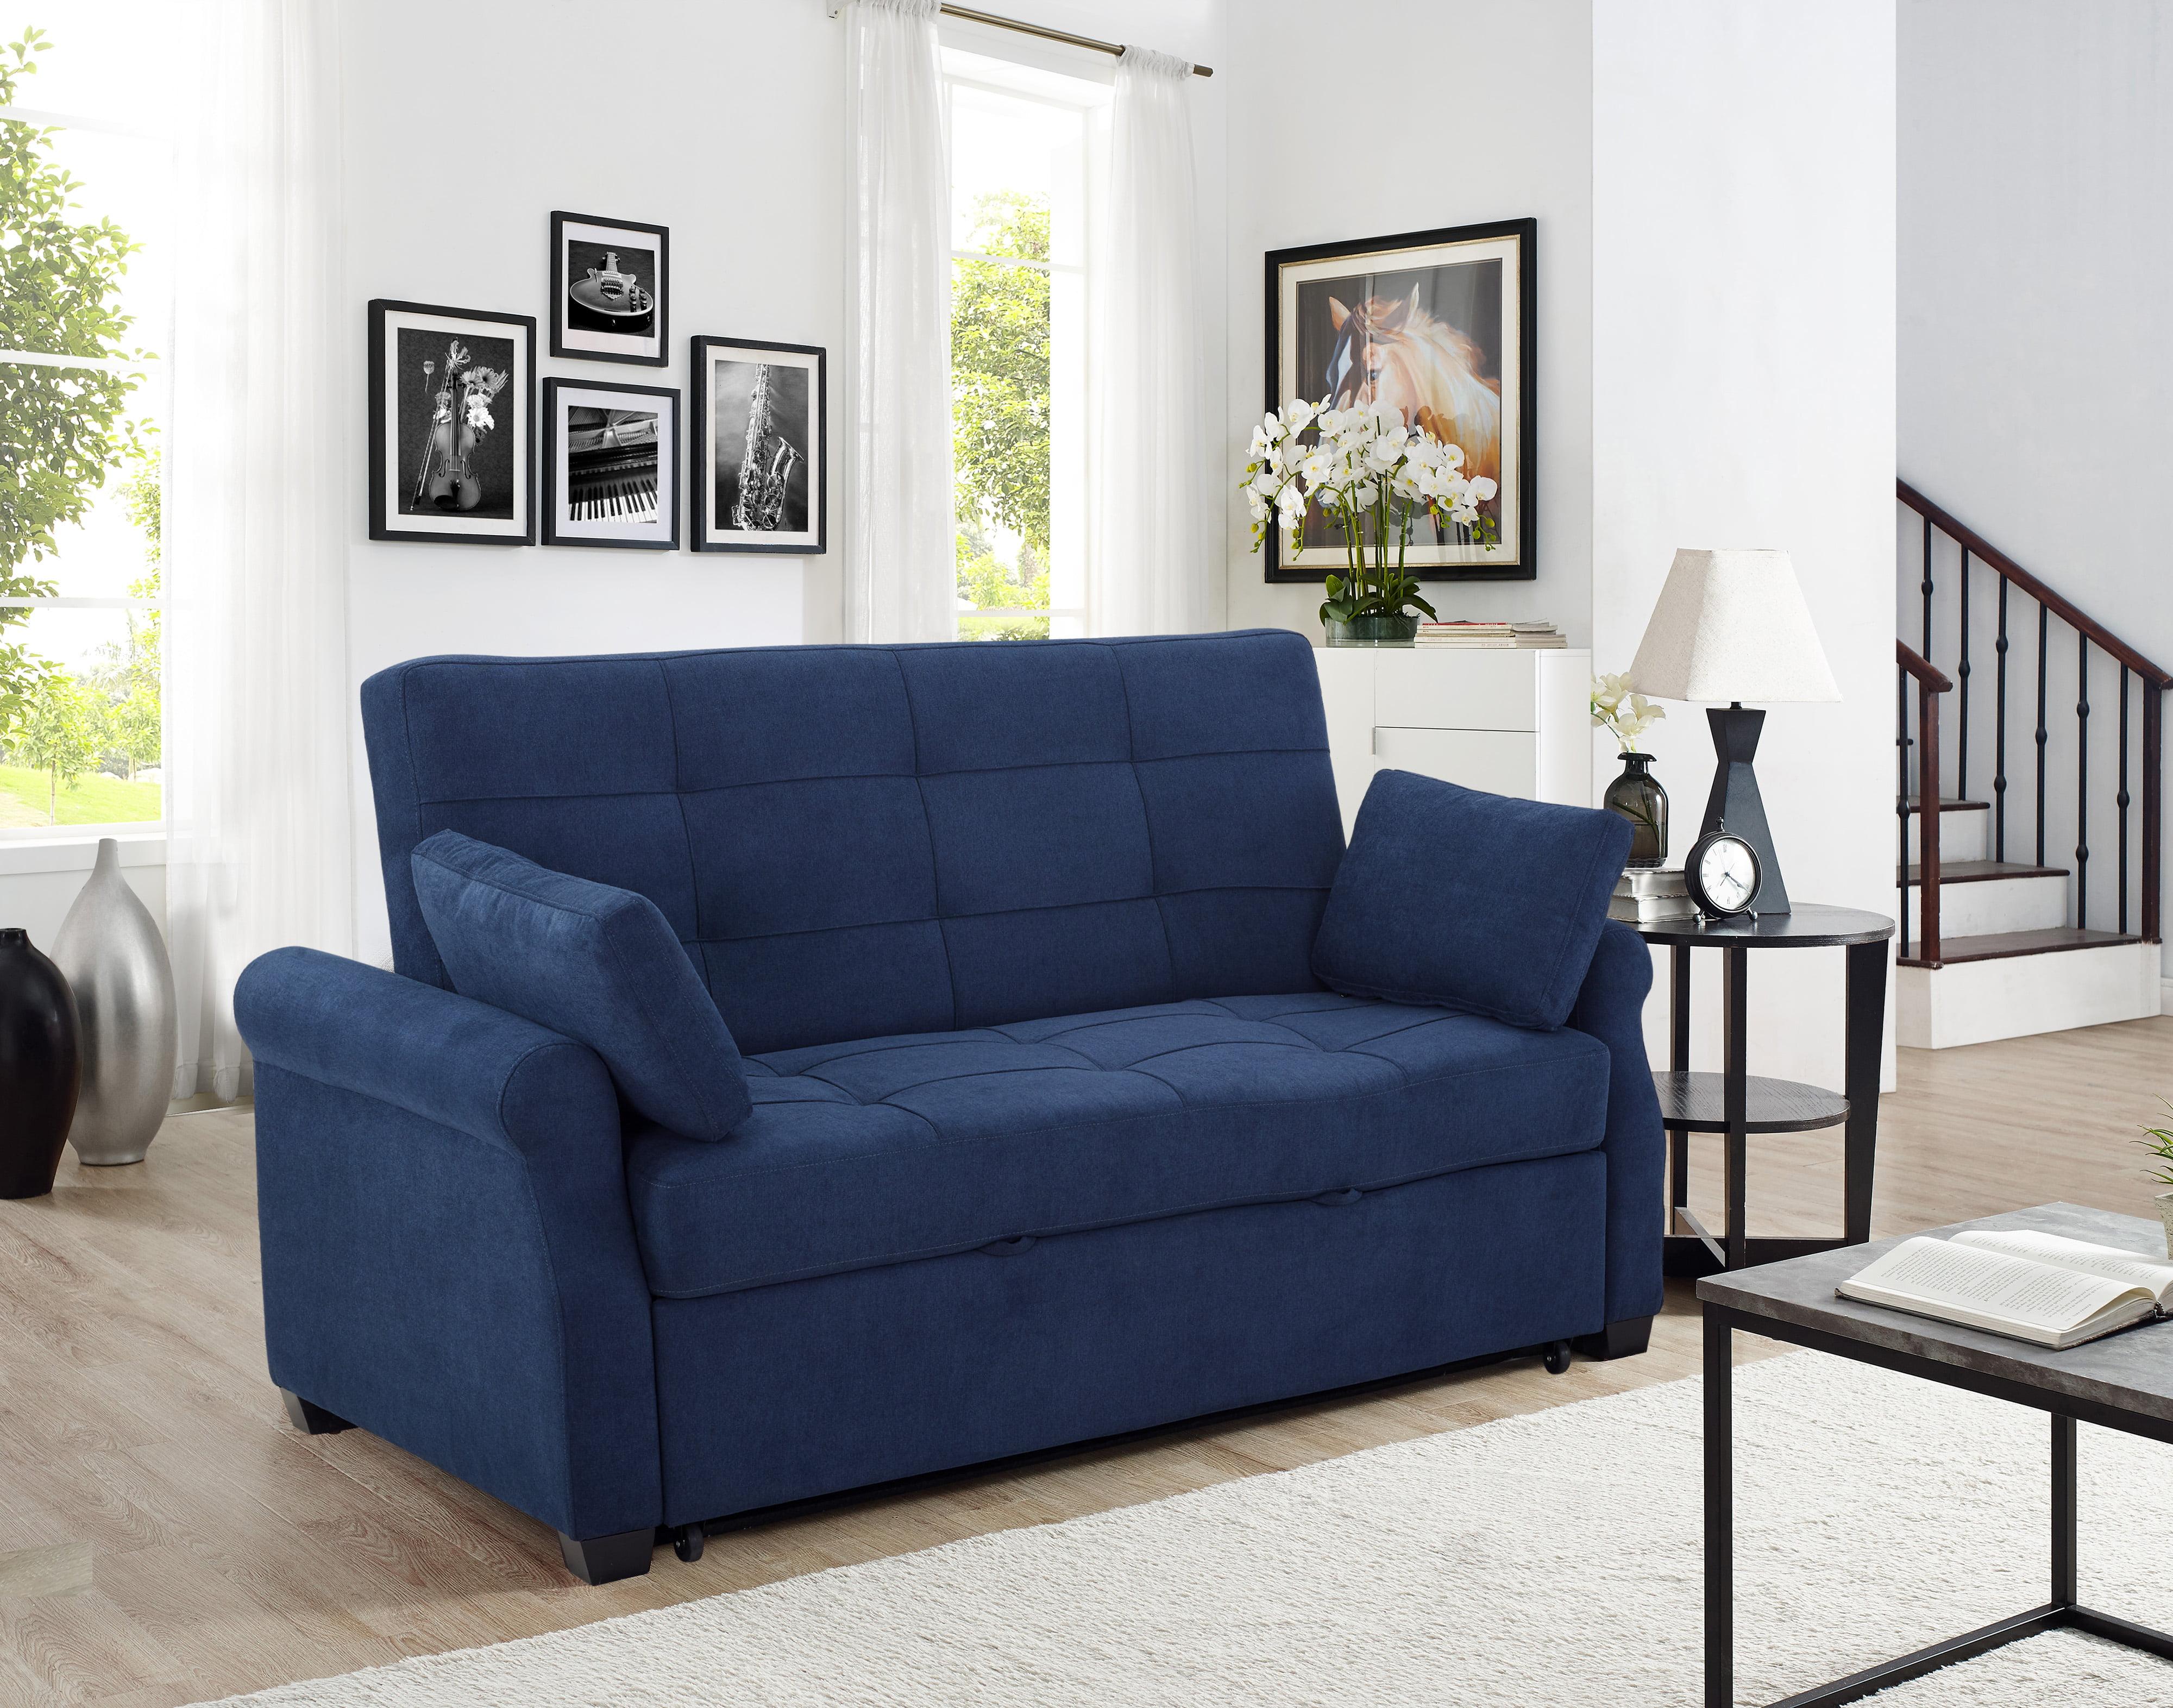 Picture of: Serta Haiden Queen Sofa Bed Gray Walmart Com Walmart Com